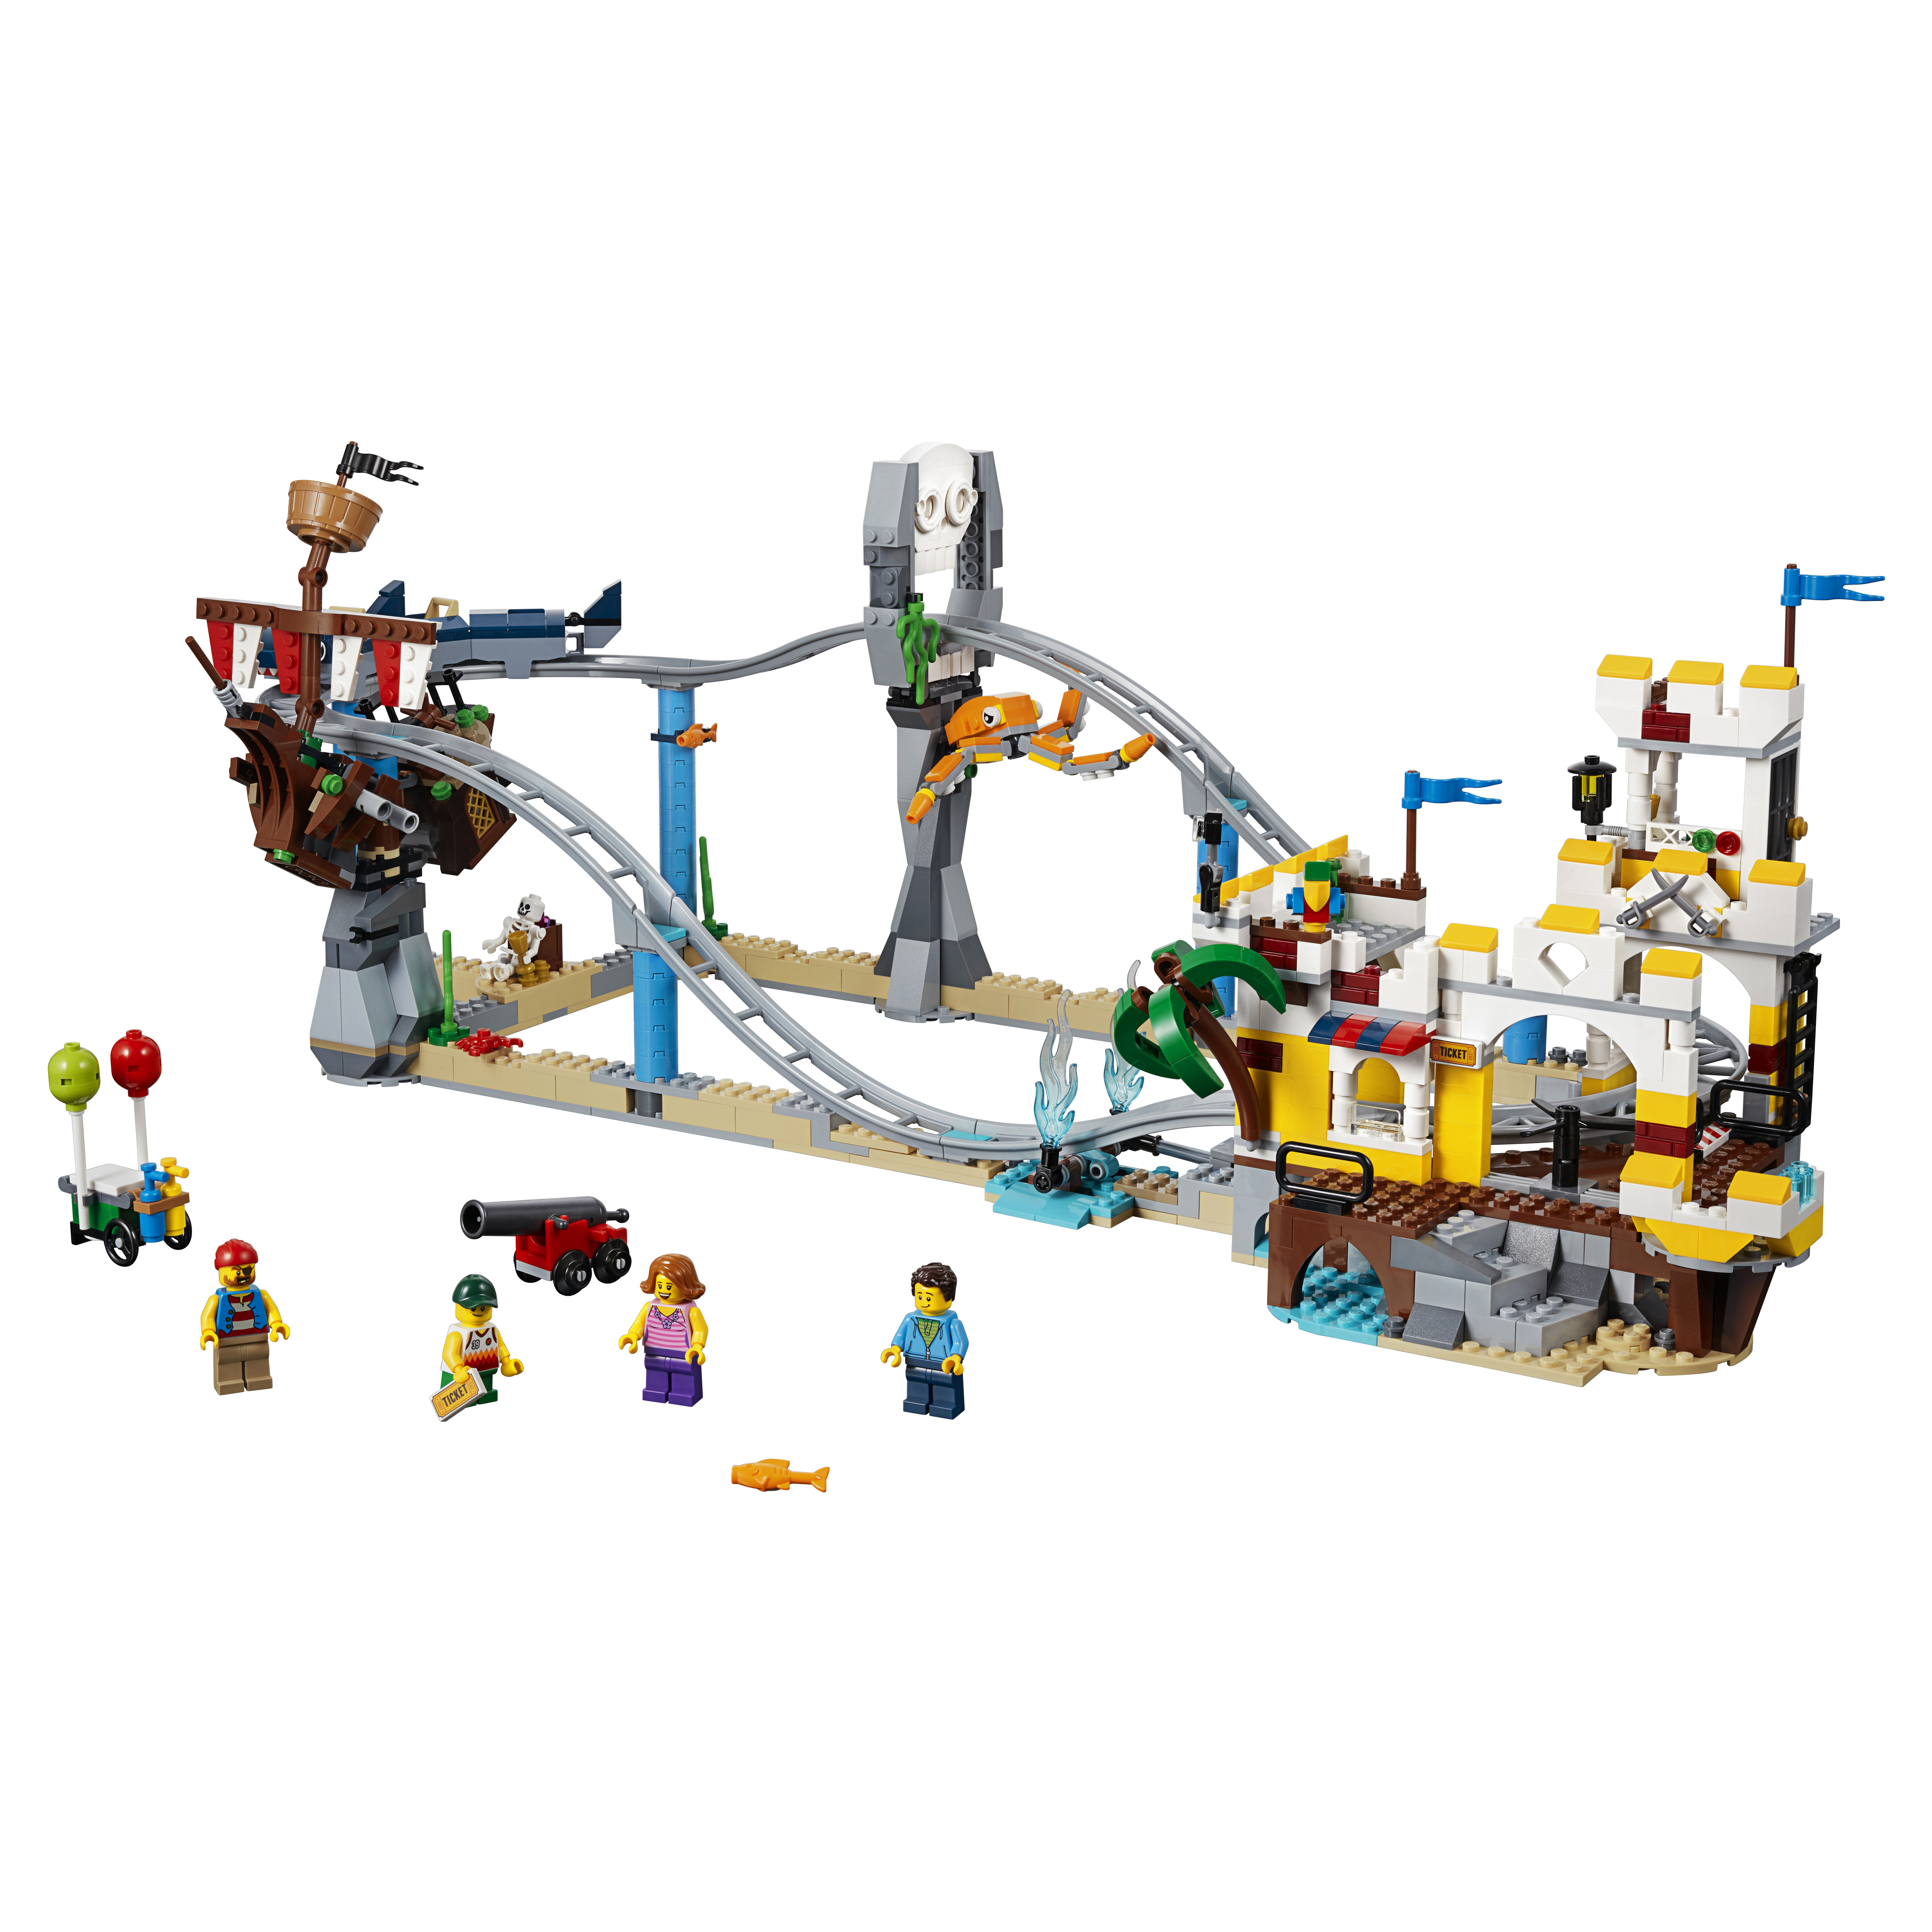 Конструктор LEGO Аттракцион Пиратские горки 31084 фото